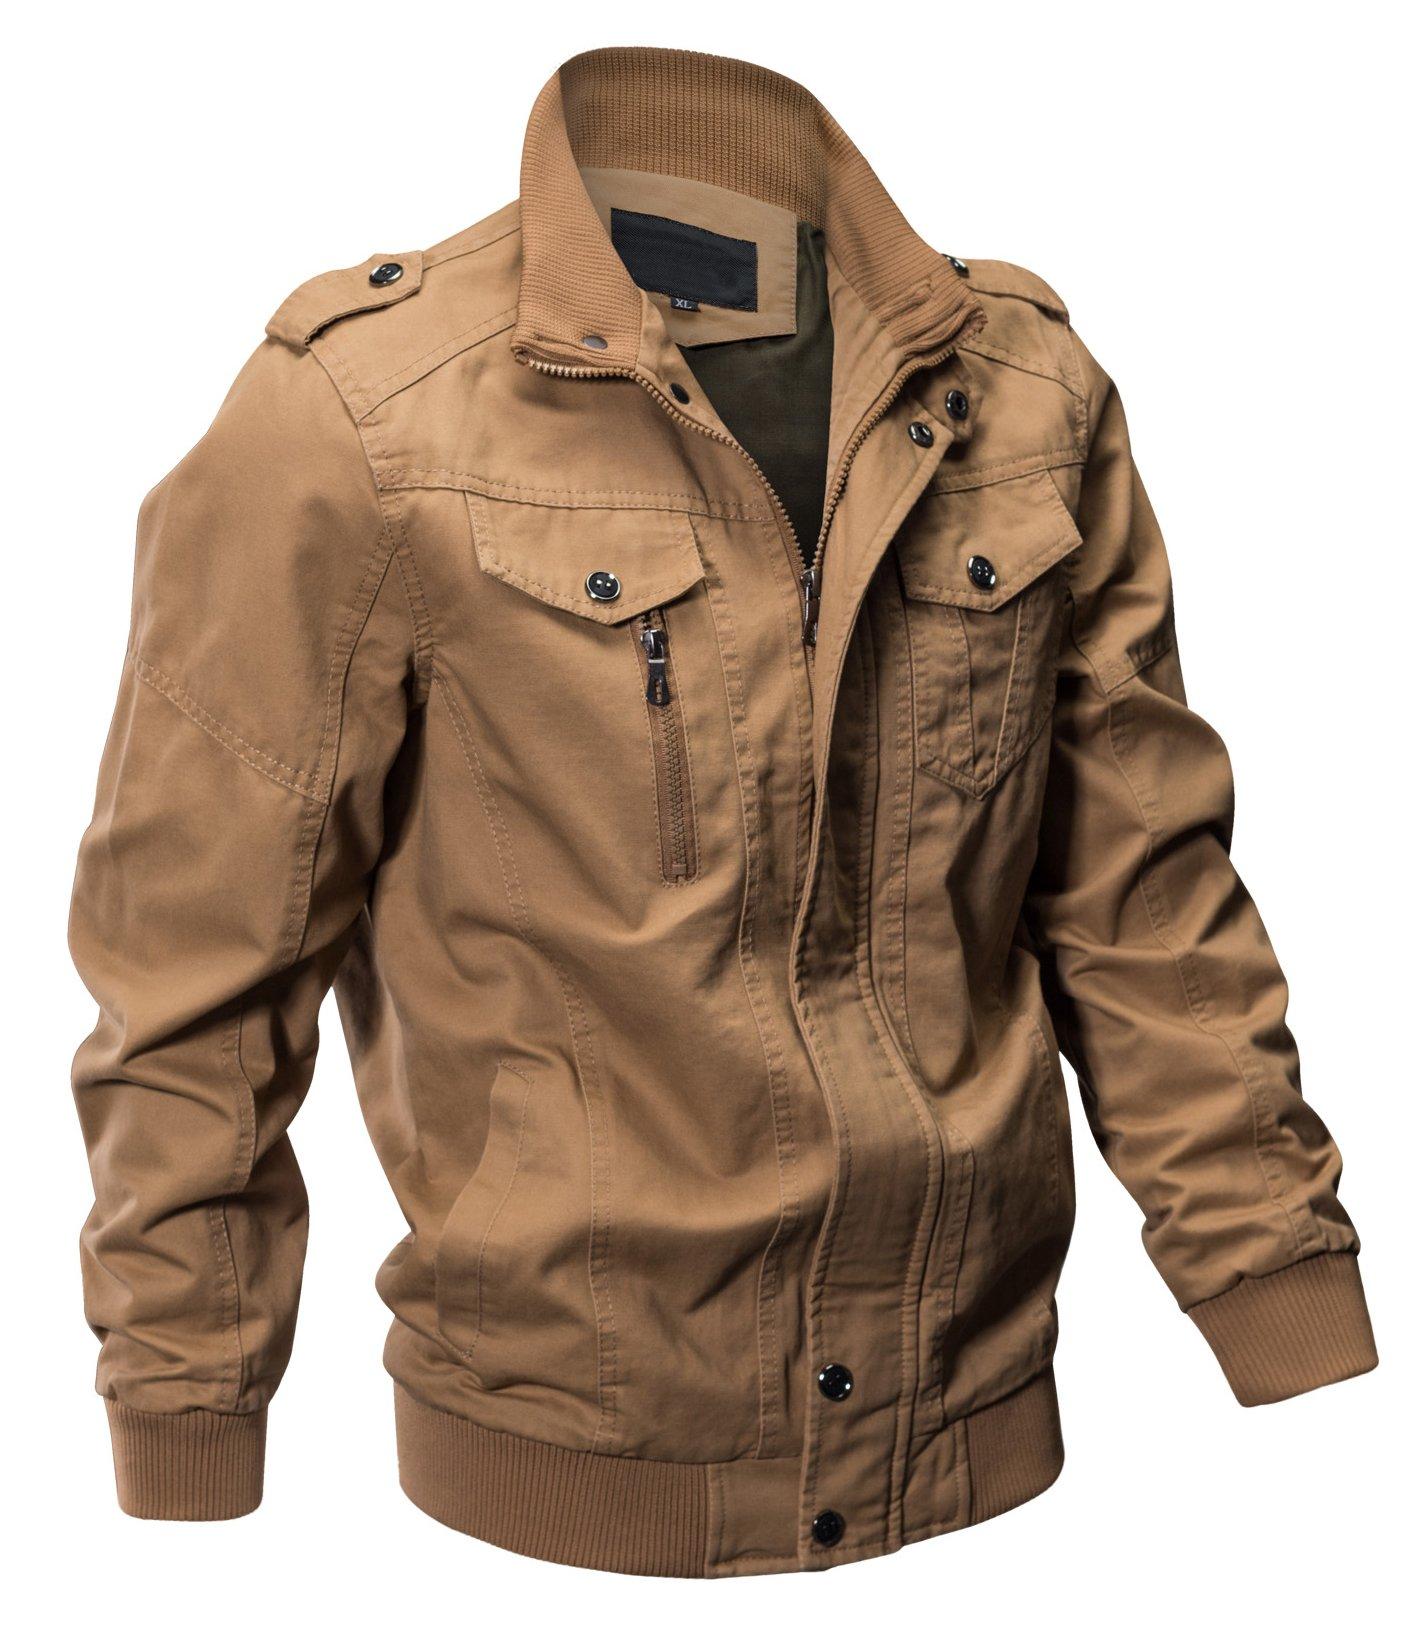 Seeksmile Men's Cotton Lightweight Casual Jacket (X-Large, Khaki) by Seeksmile